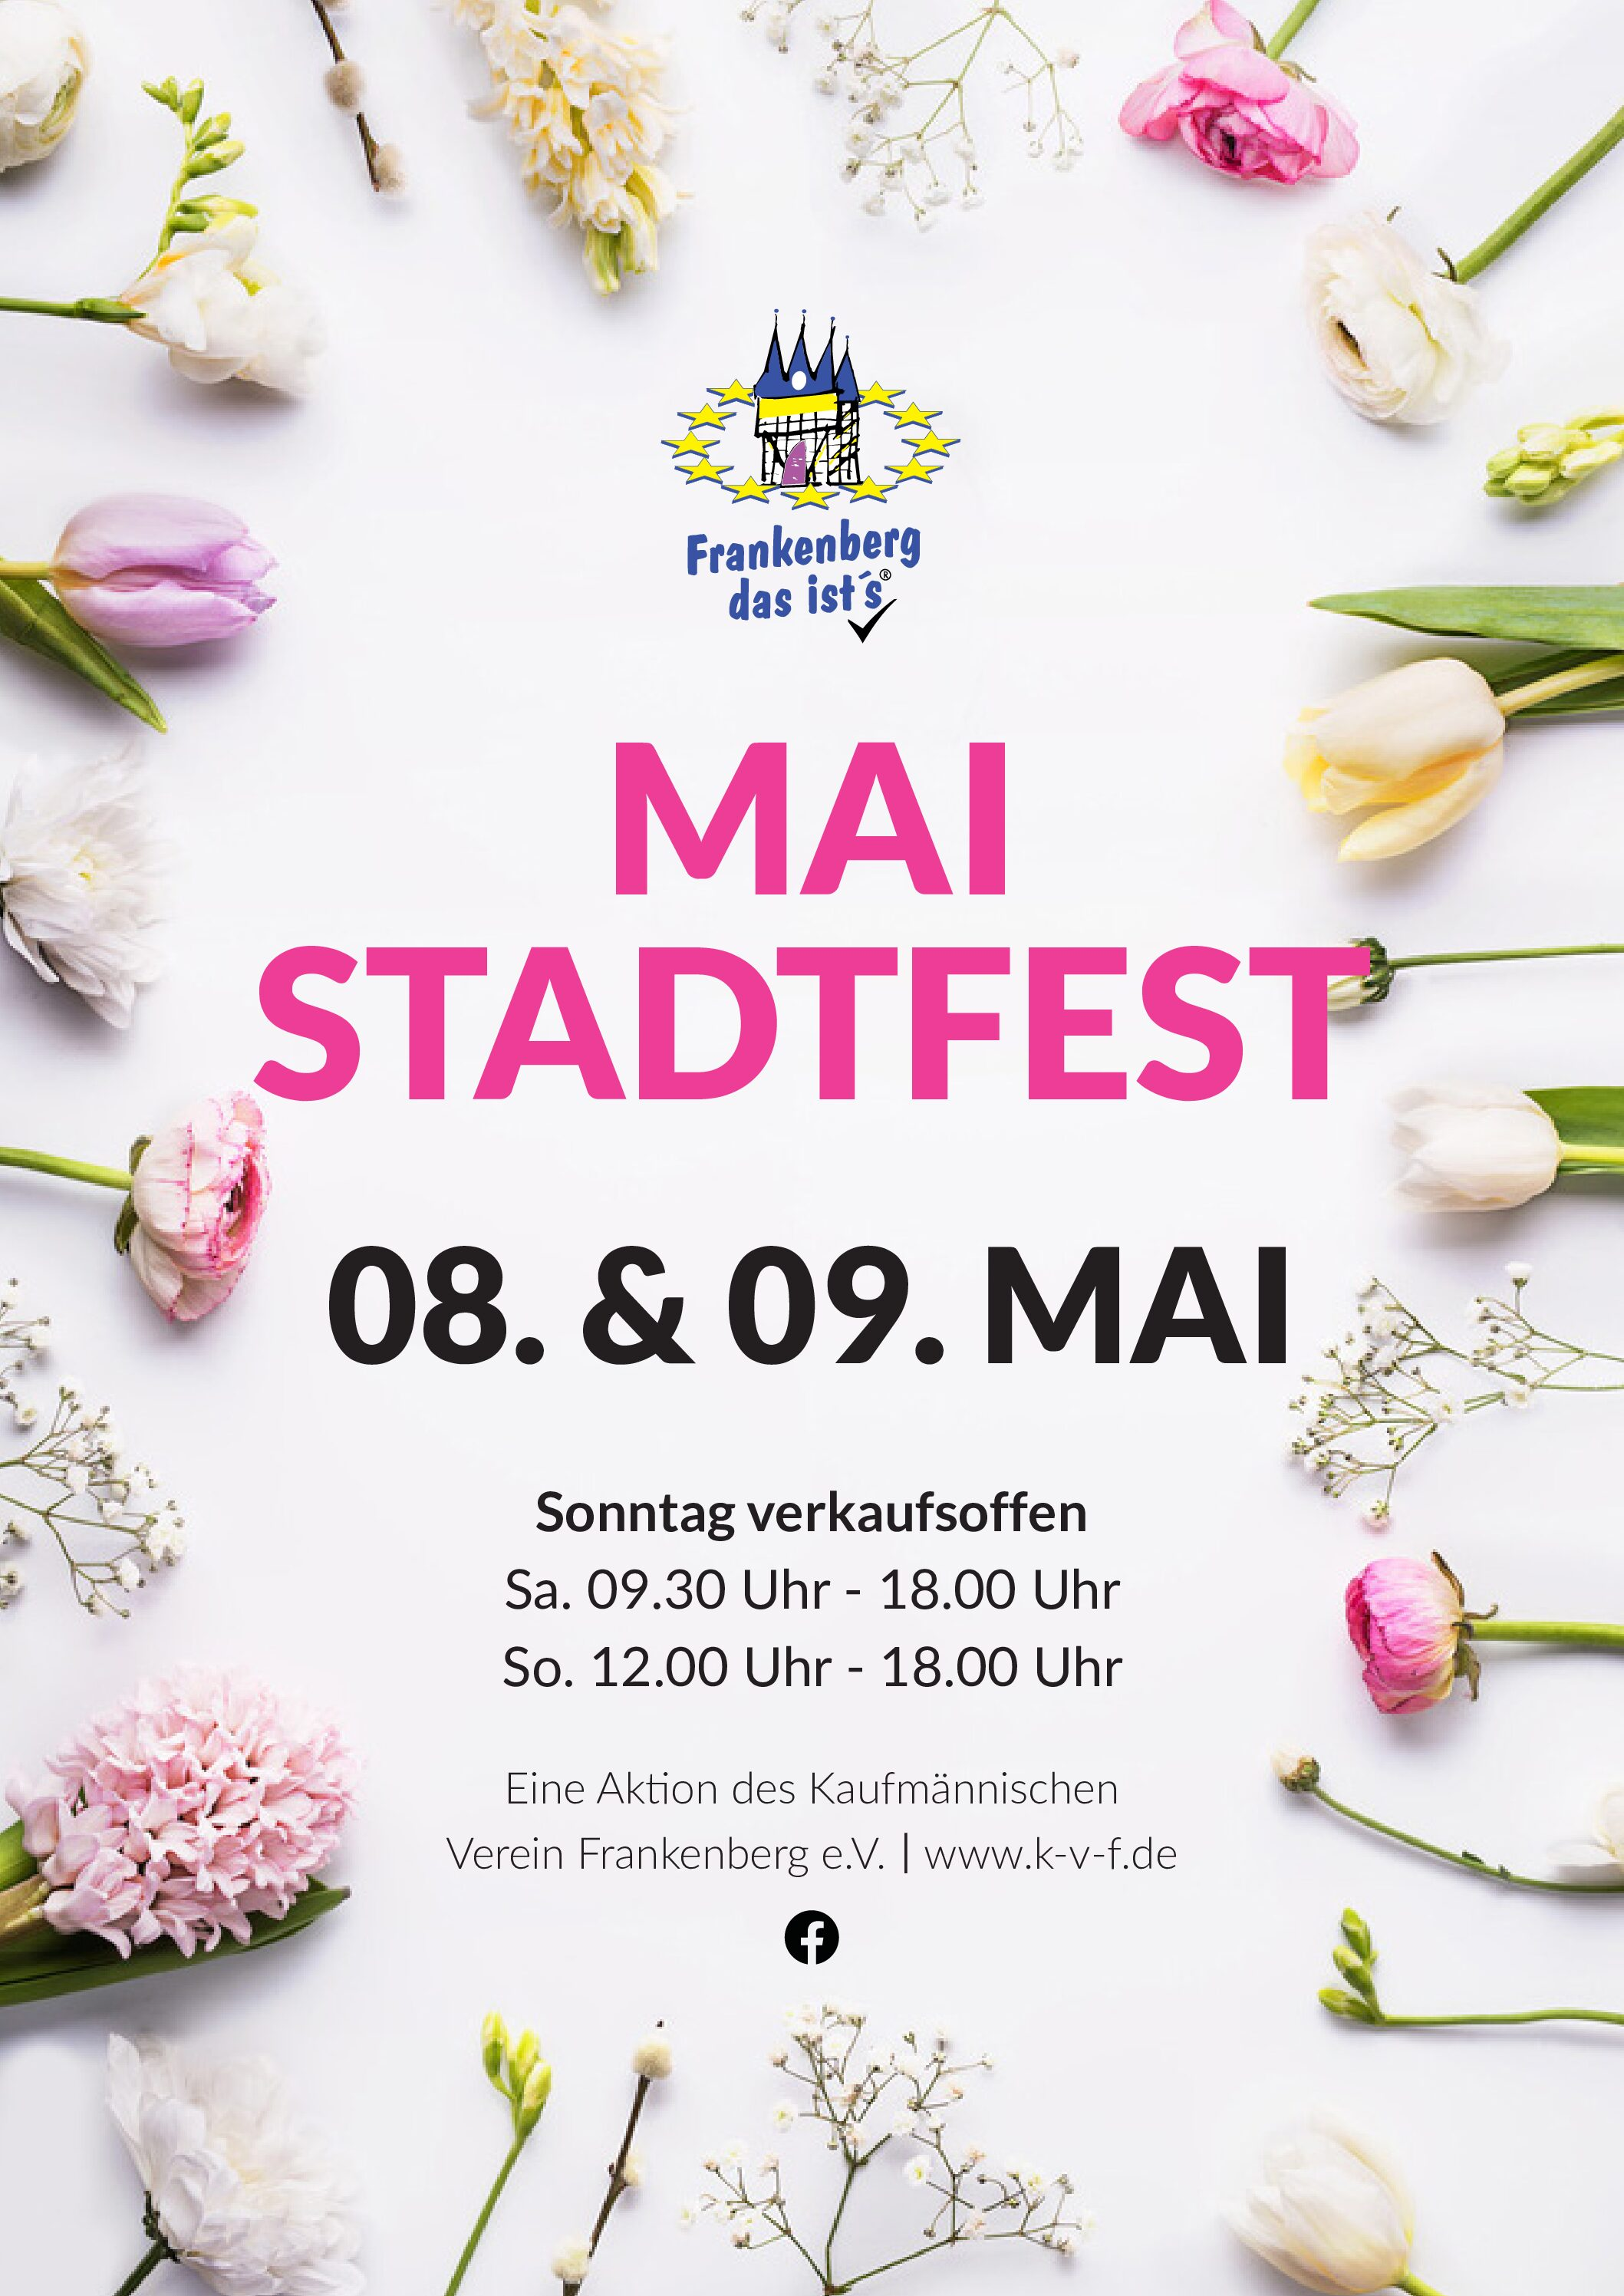 Maistadtfest 2021